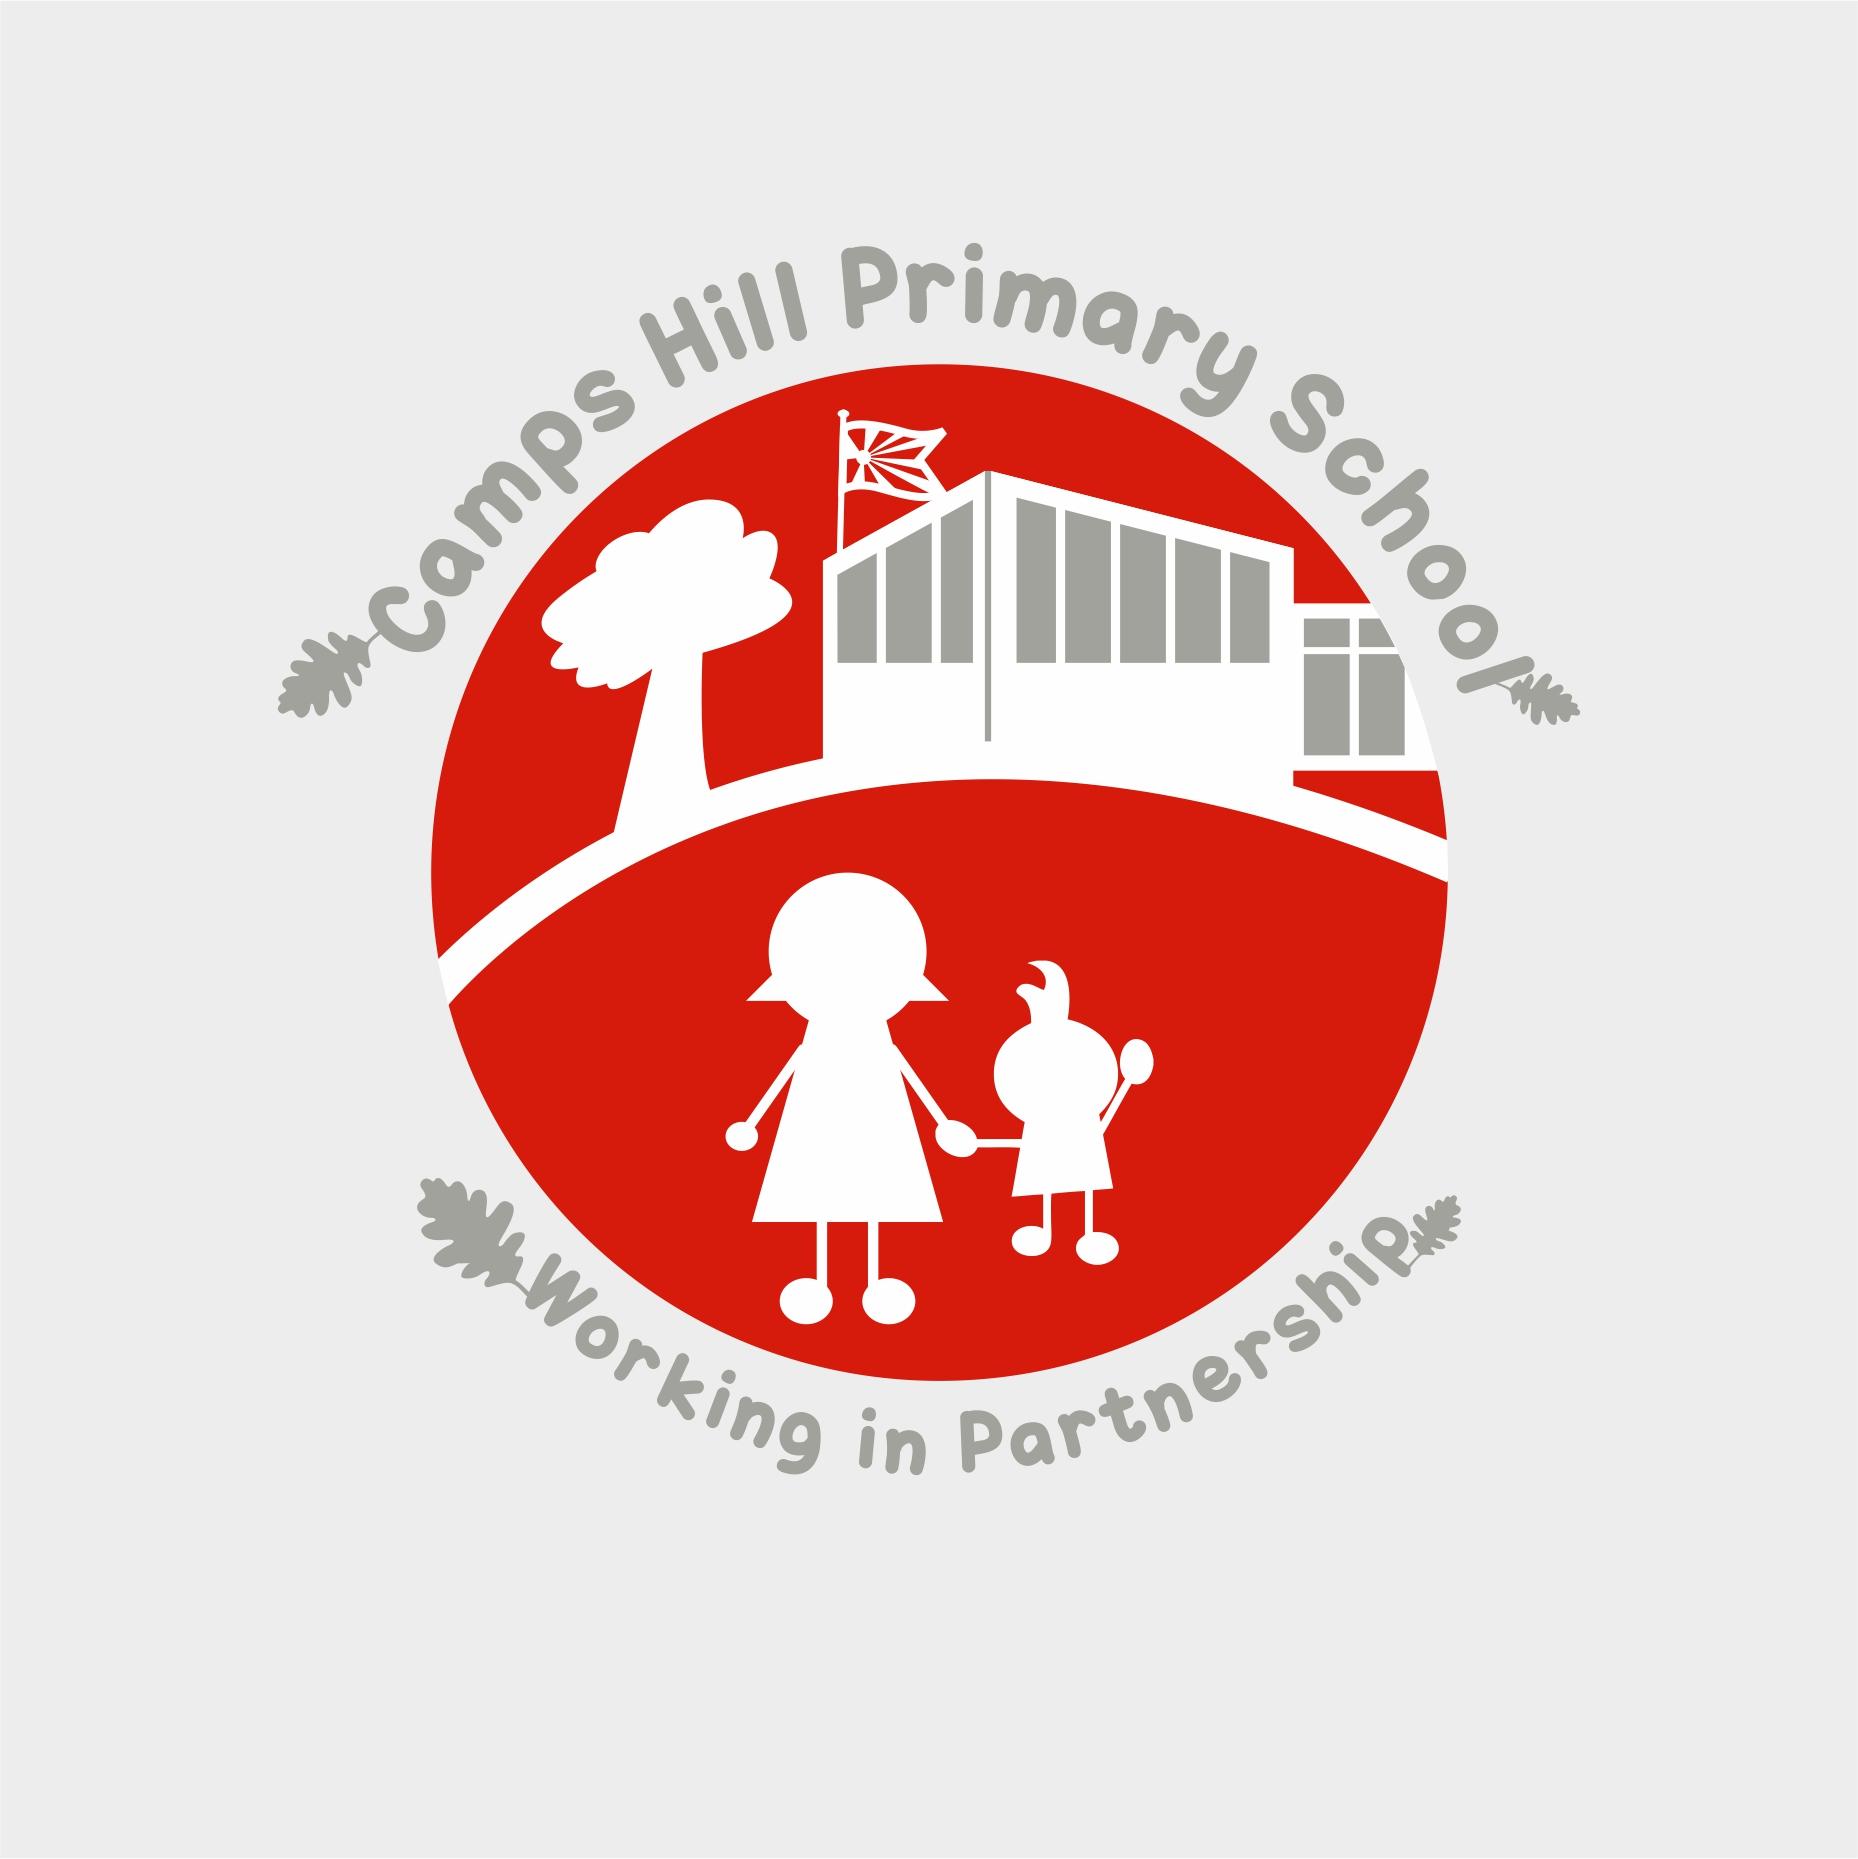 Camps Hill Primary School logo.jpg